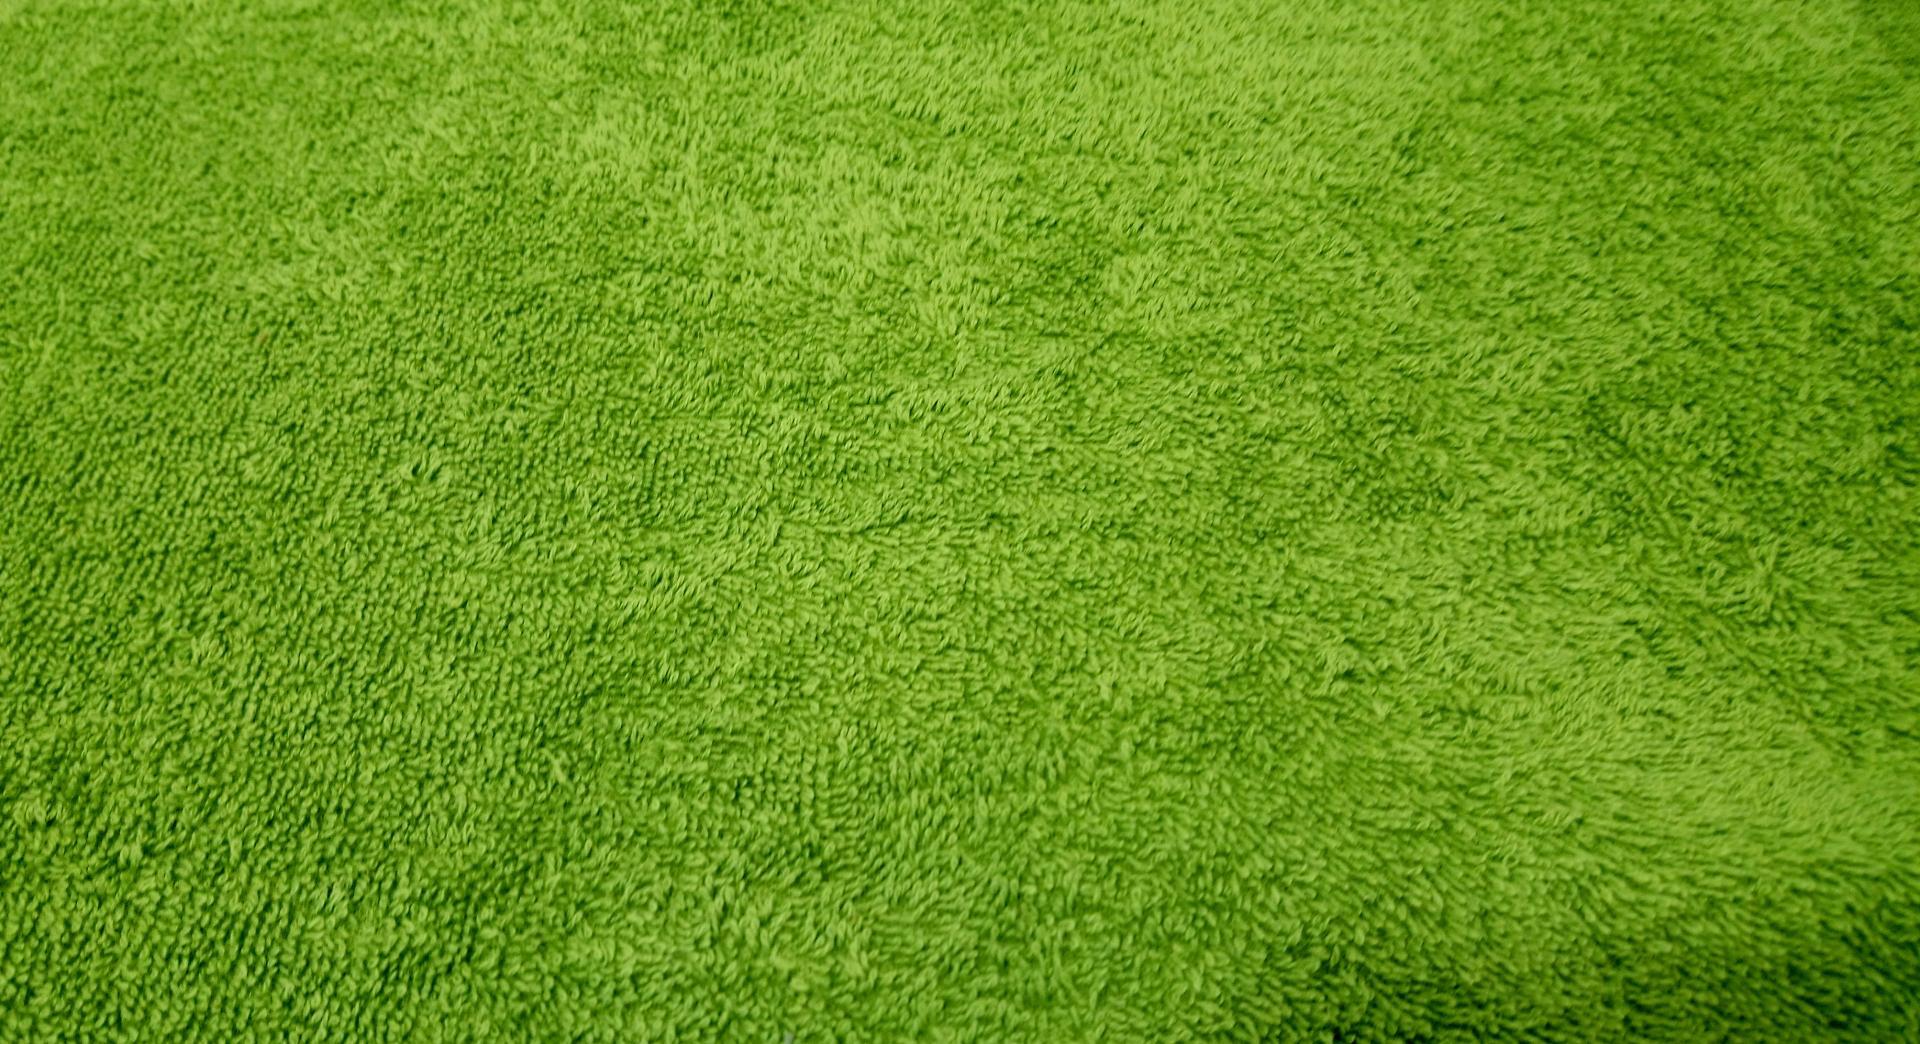 Eponge vert mousse 3